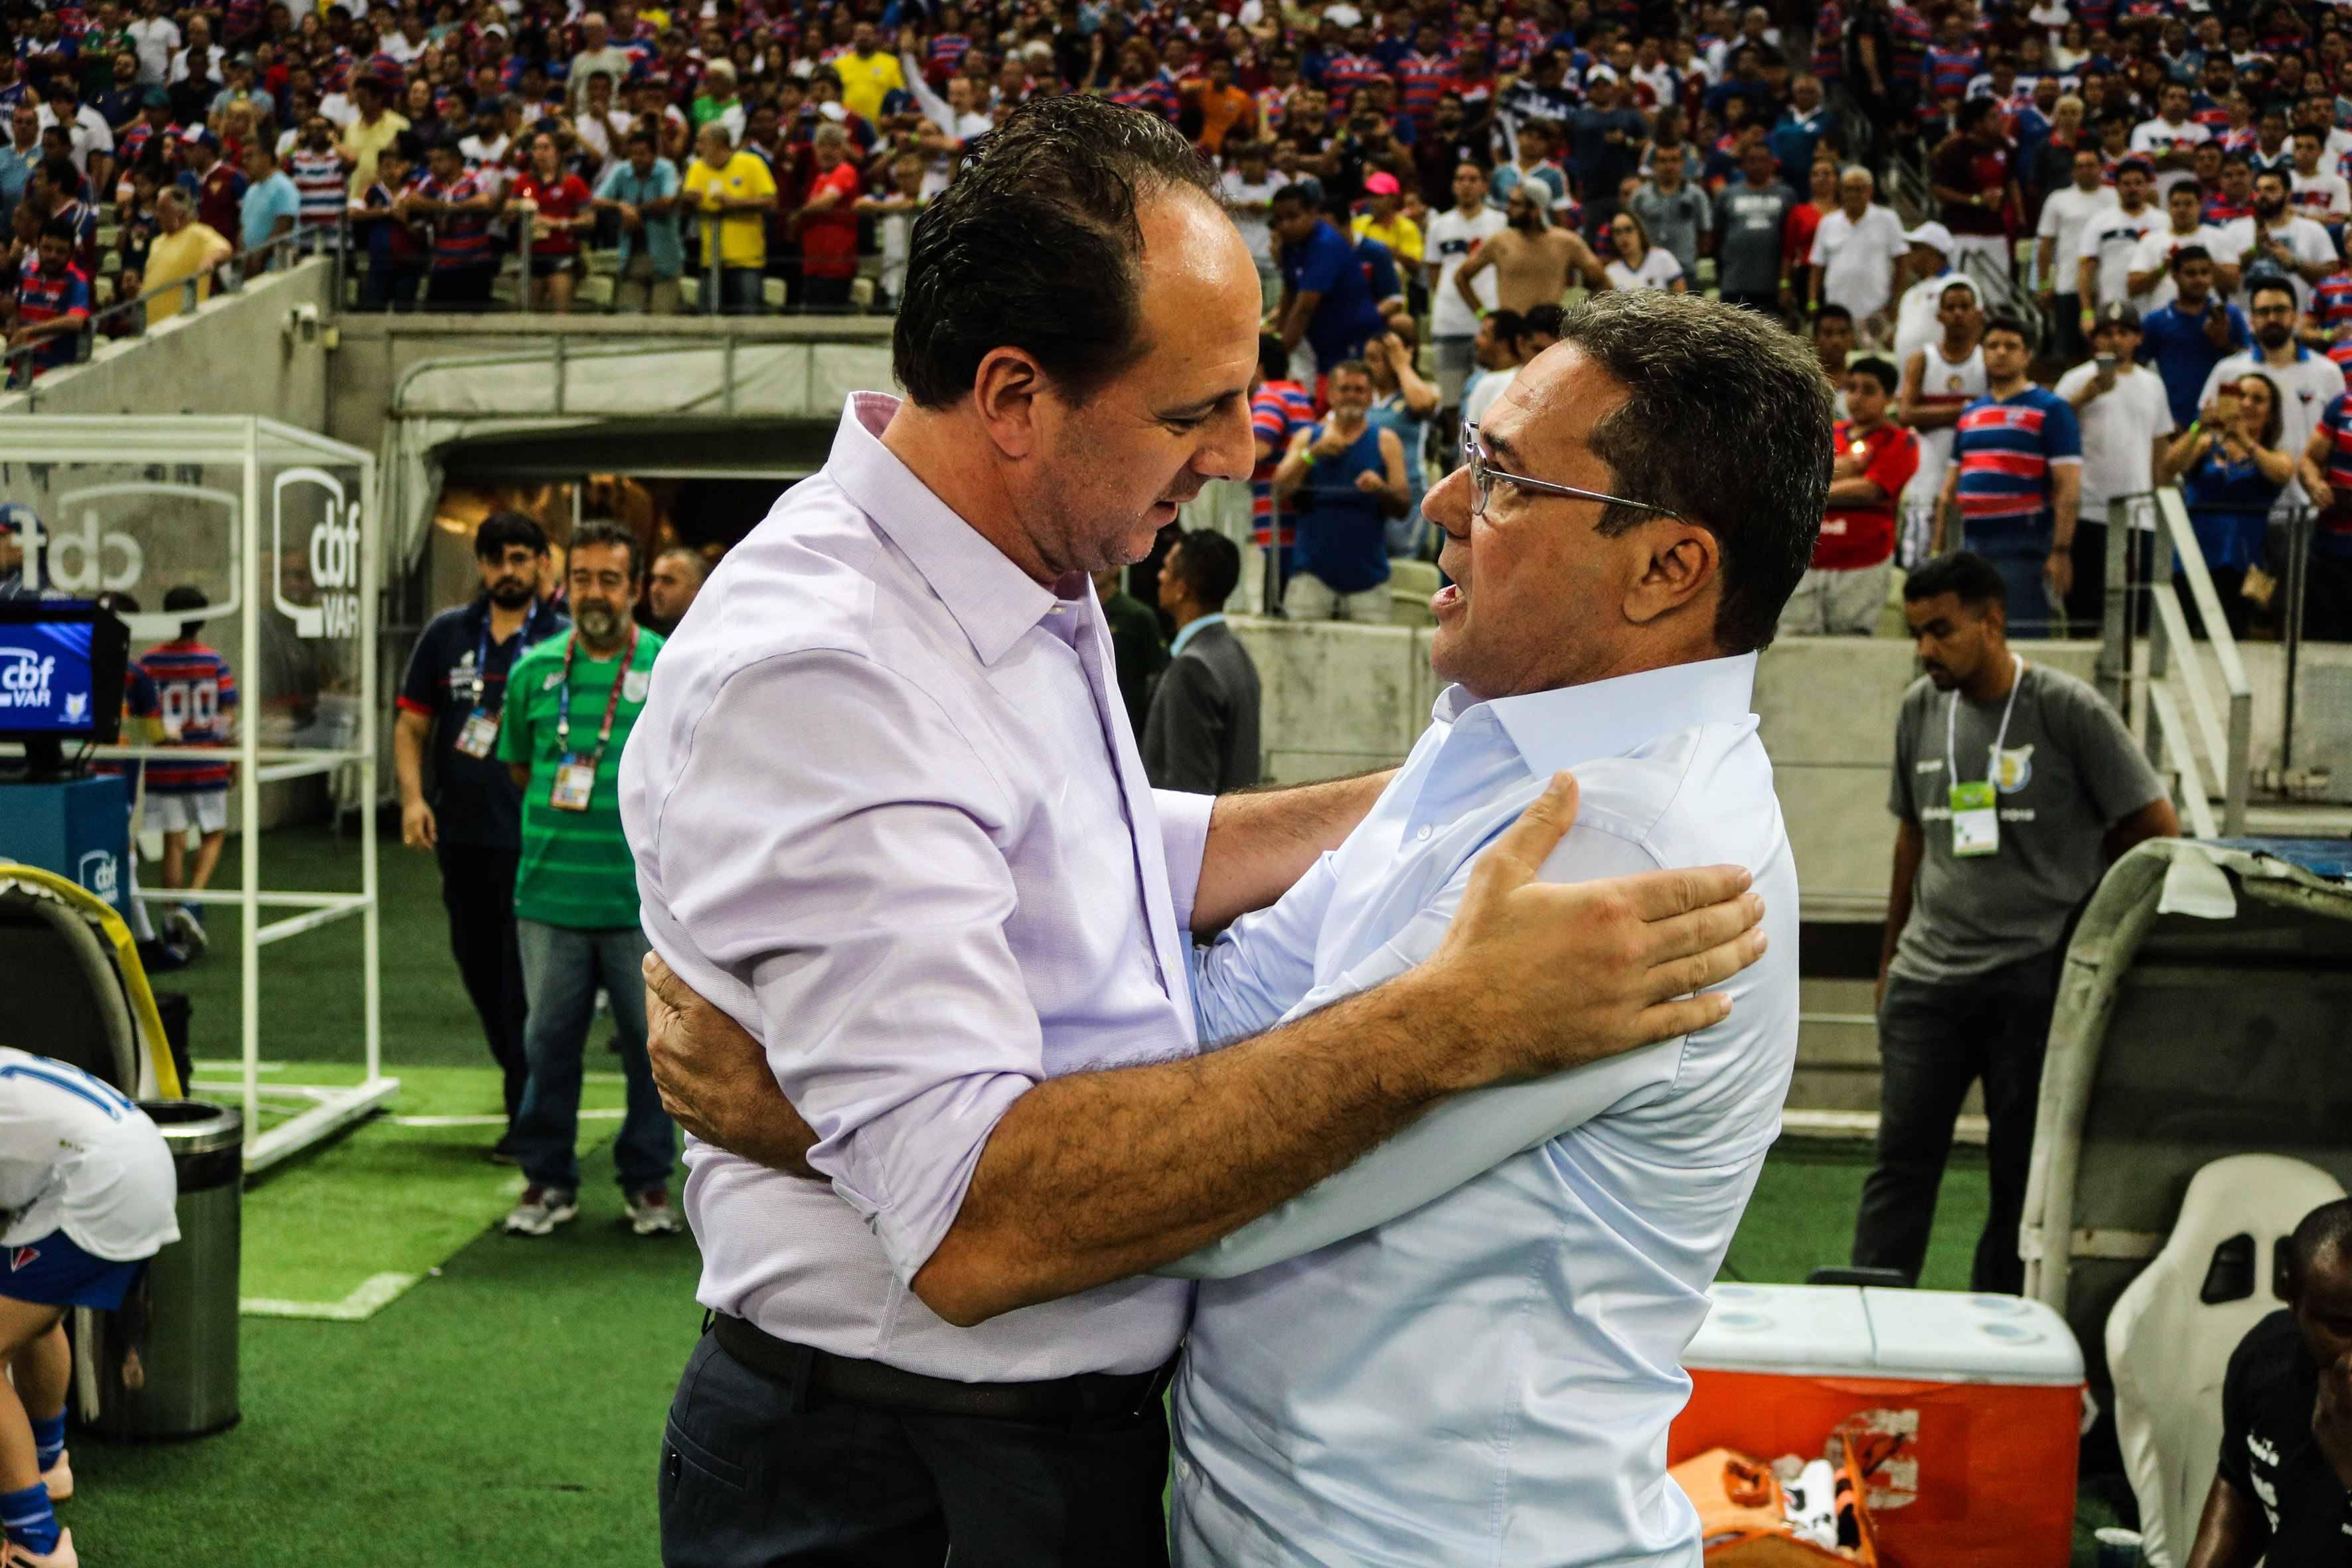 Foto: Ronaldo Oliveira/Photo Premium/Agencia O Globo